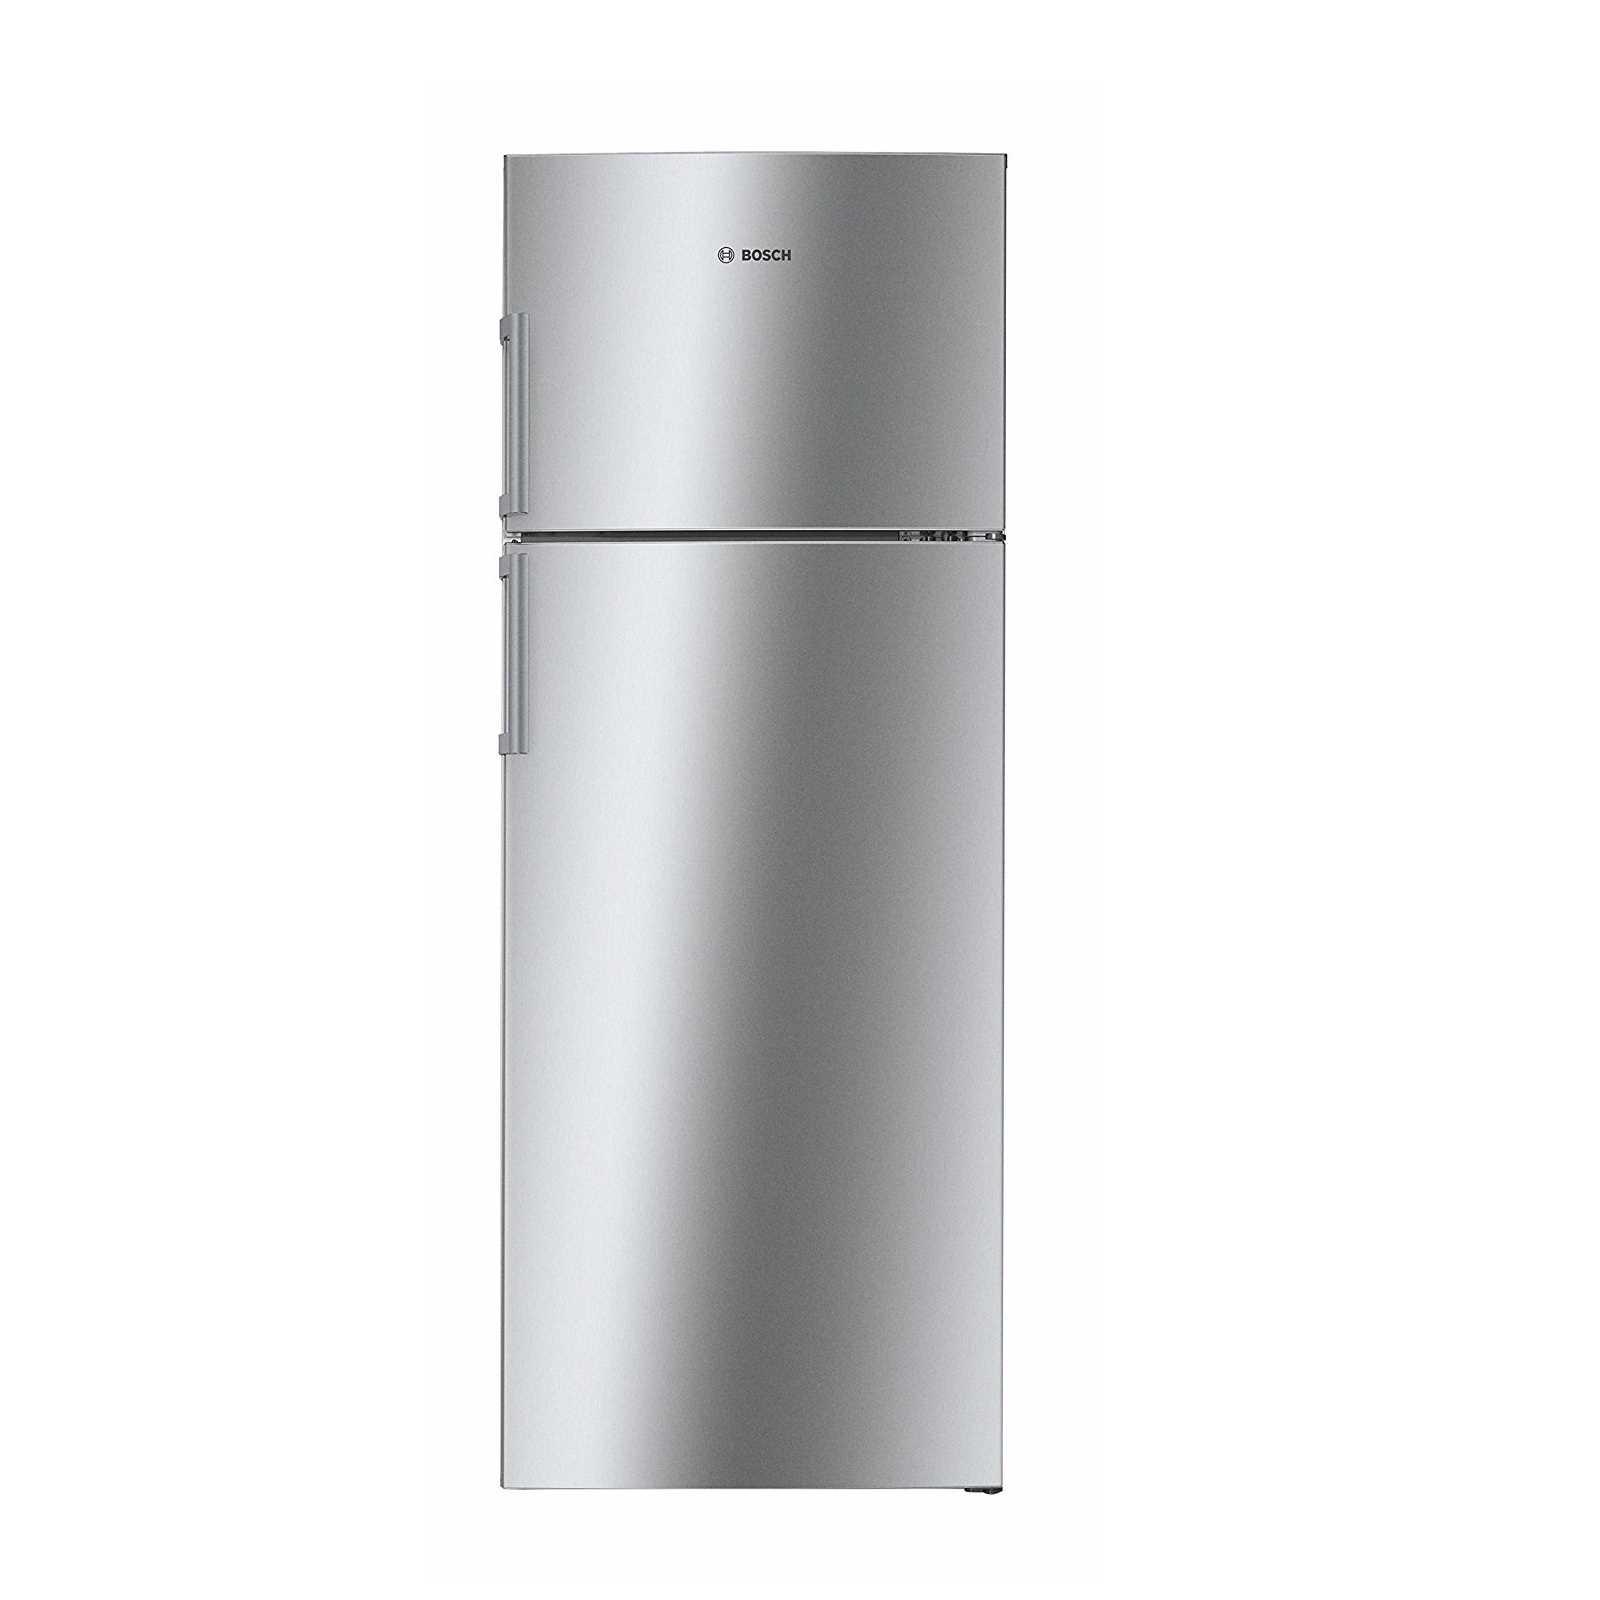 Bosch KDN43VL40I 347 Litres Double Door Frost Free Refrigerator